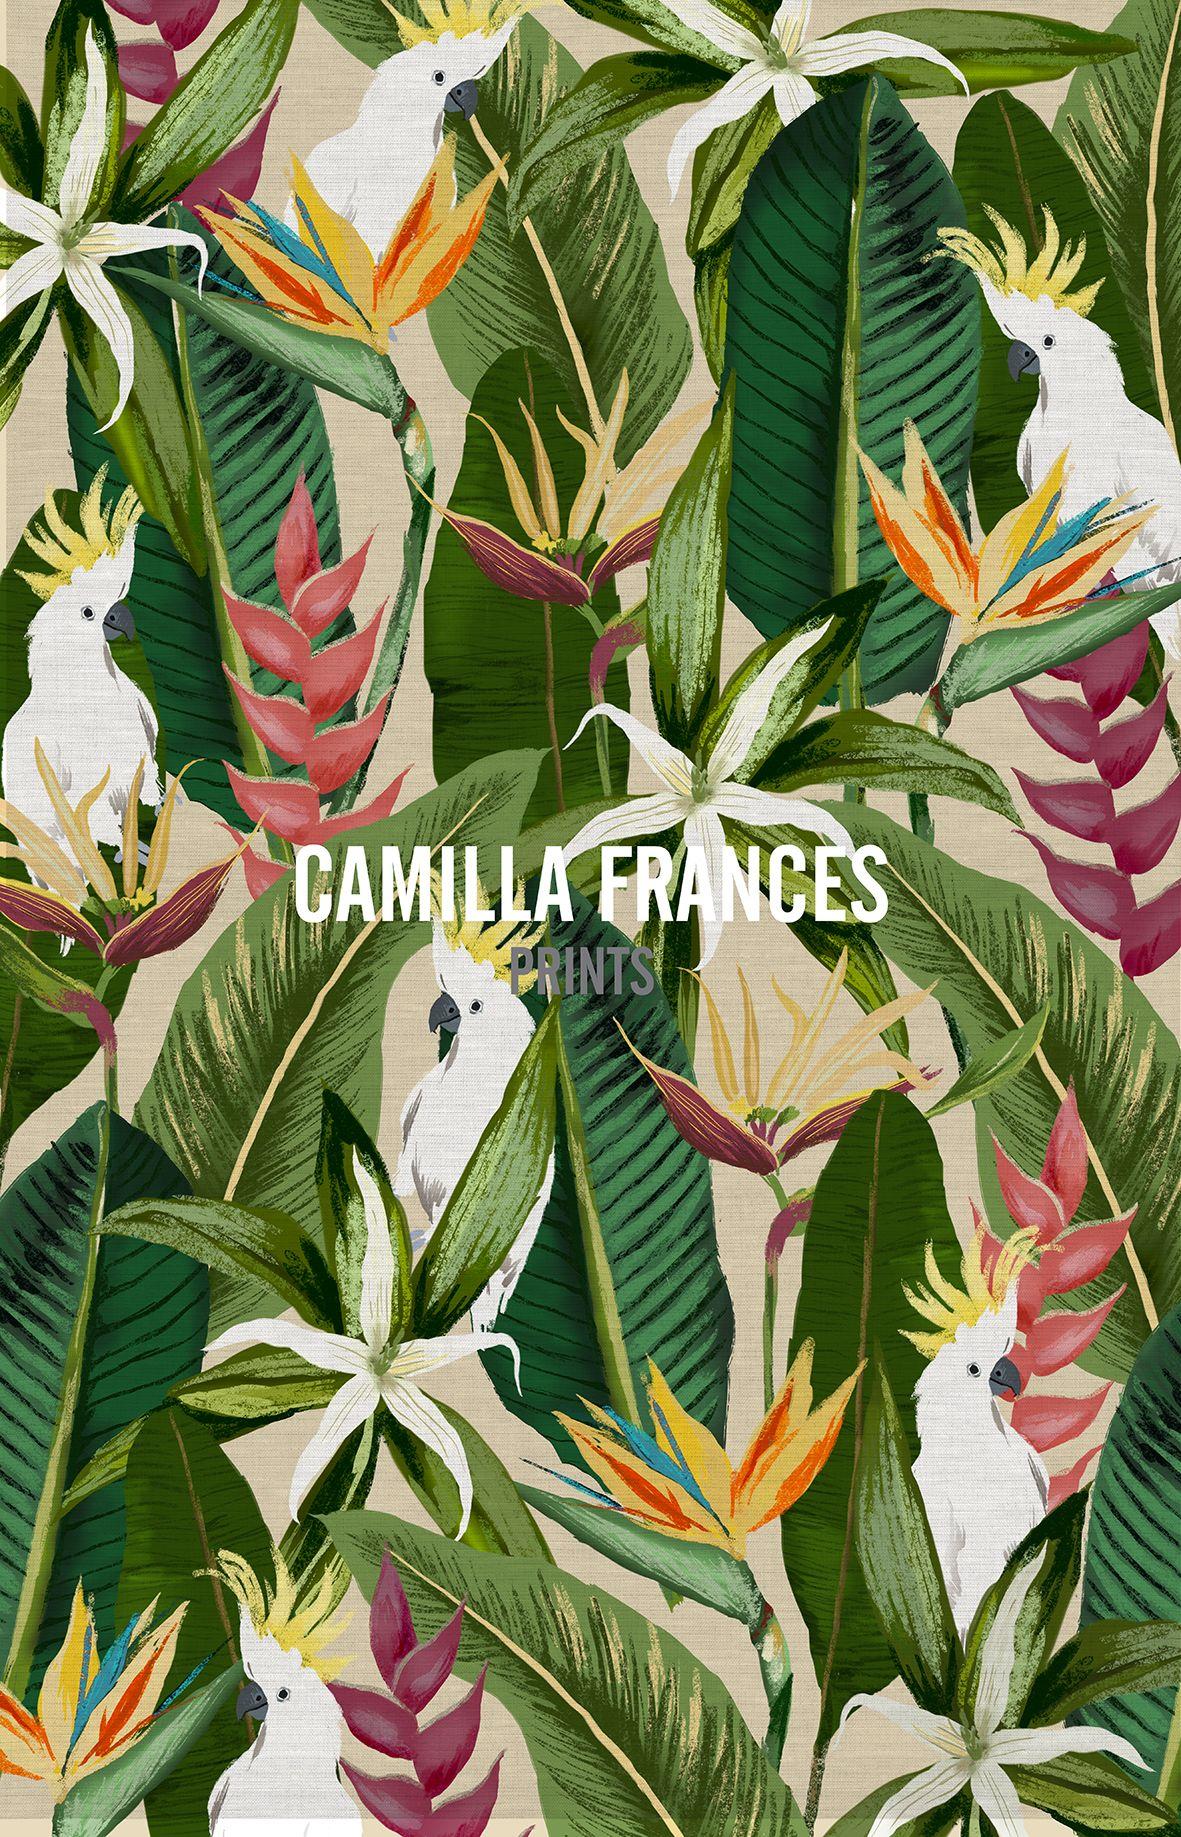 Tropical camilla frances prints i love it for Childrens jungle print fabric